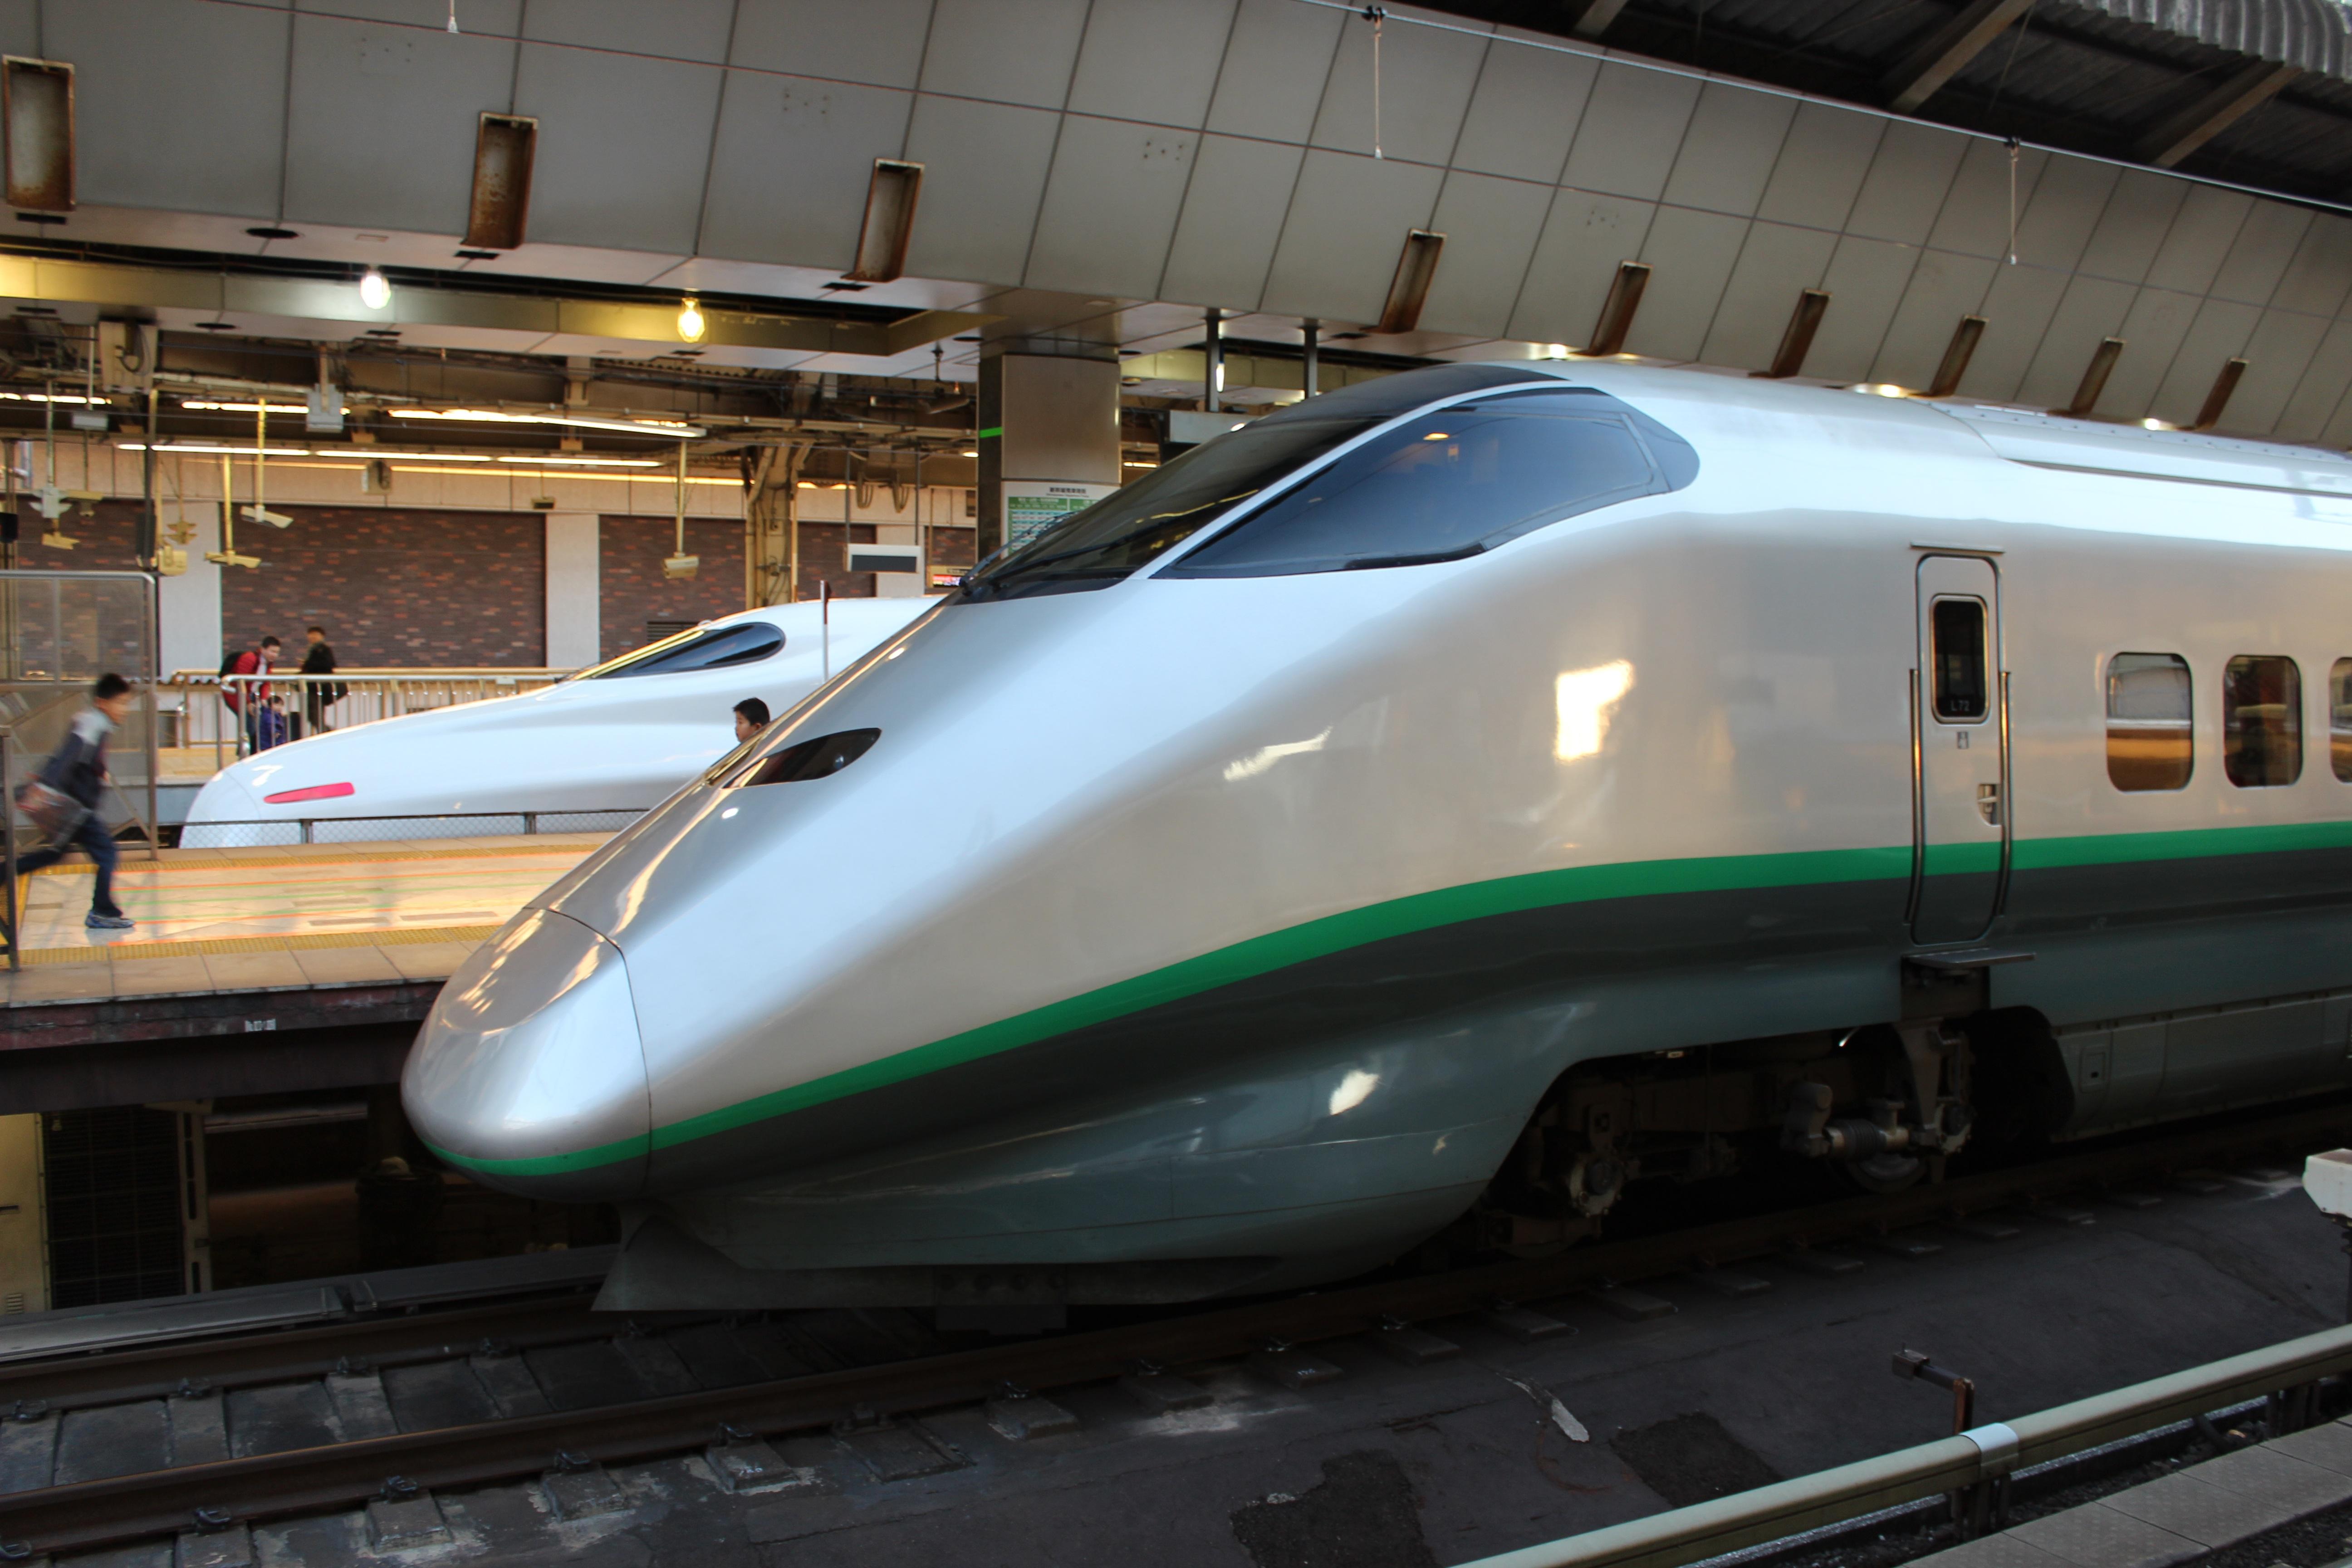 free images public transport rail transport tgv bullet train